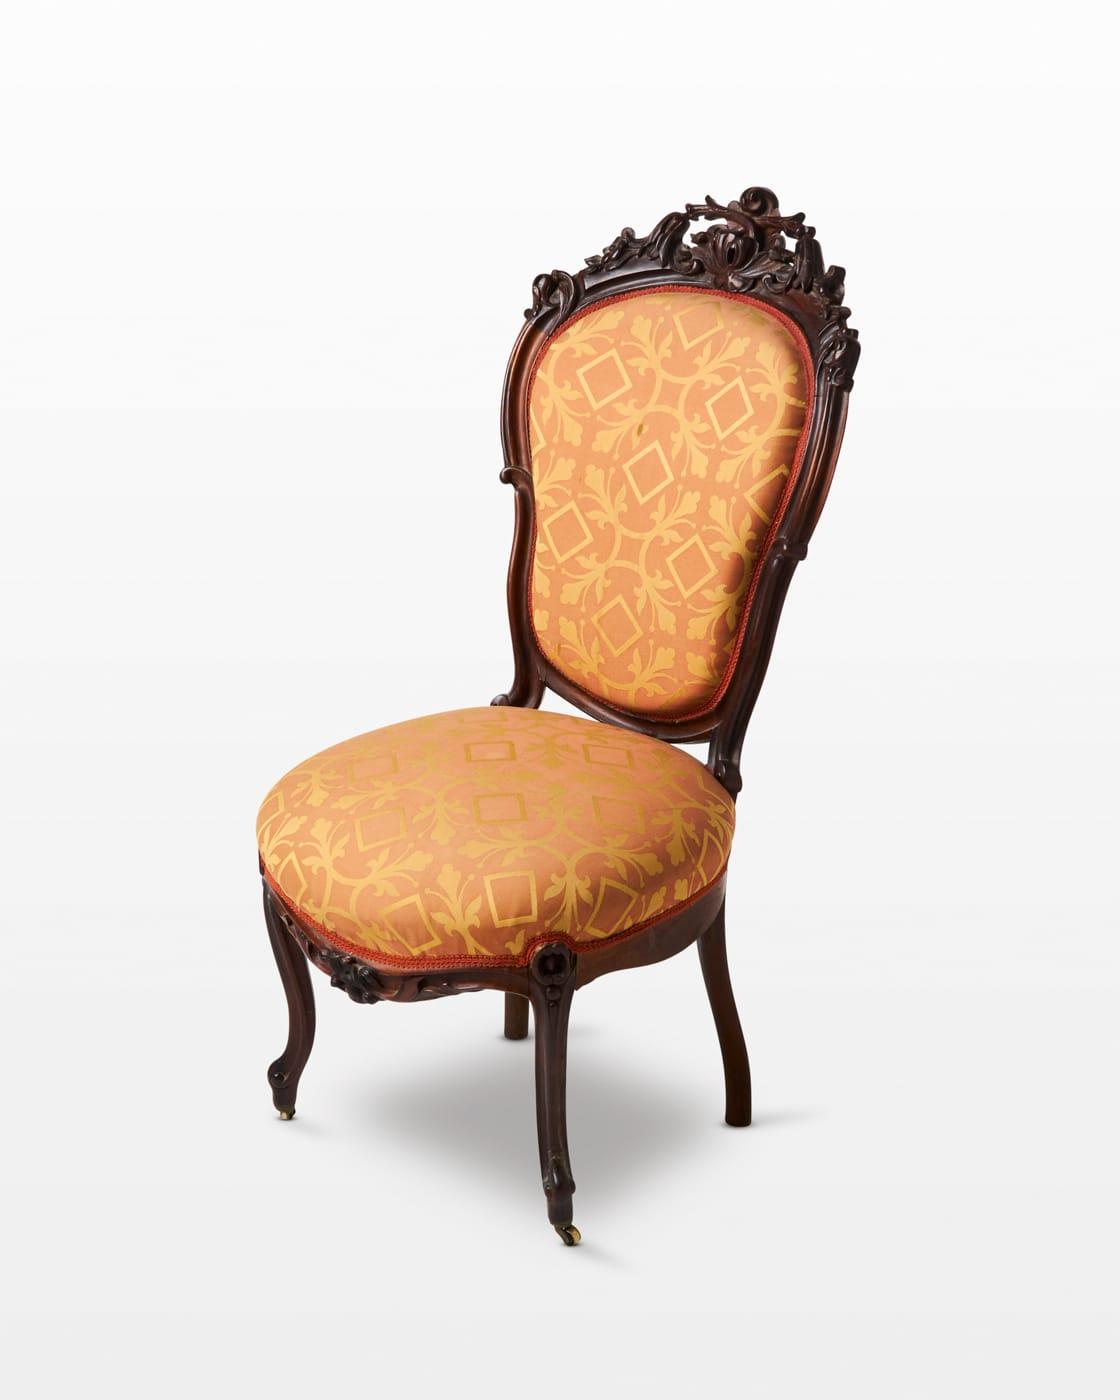 1ff059047e3 CH267 Ripley Chair Prop Rental